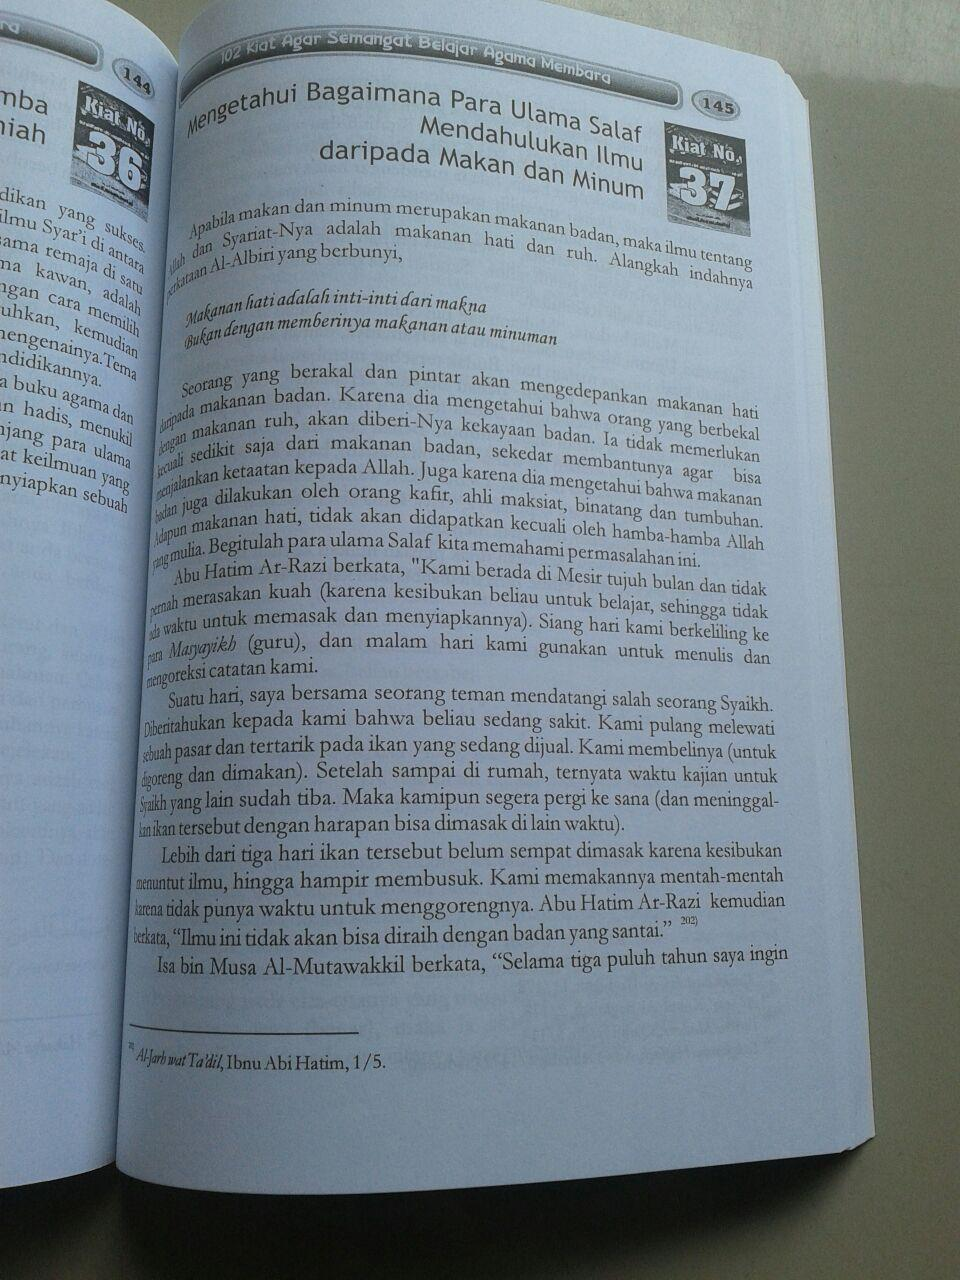 Buku 102 Kiat Agar Semangat Belajar Agama Membara isi 4